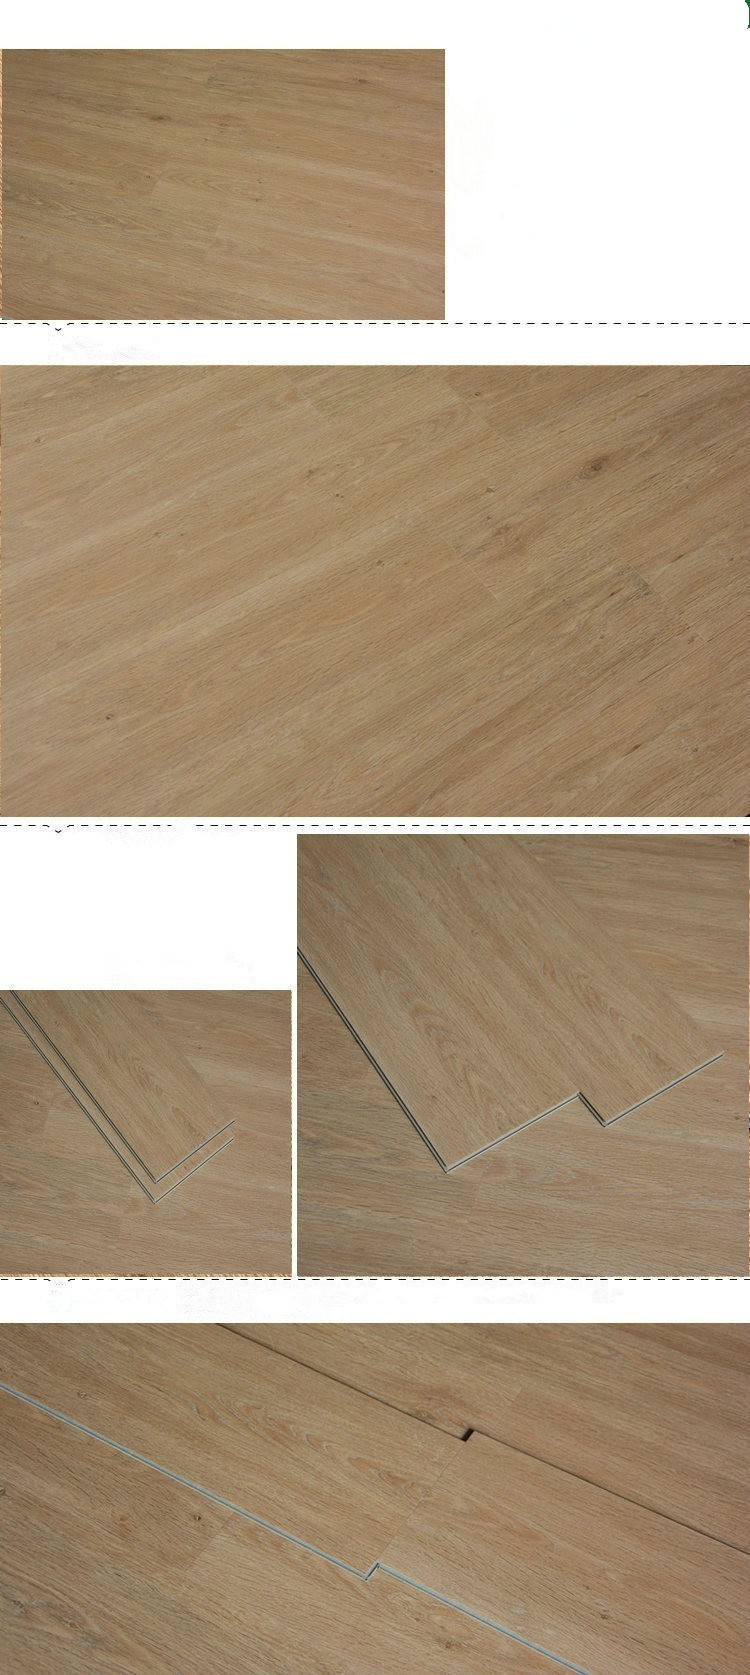 Commercial Pvc Flooring : Commercial waterproof click pvc vinyl floor covering buy